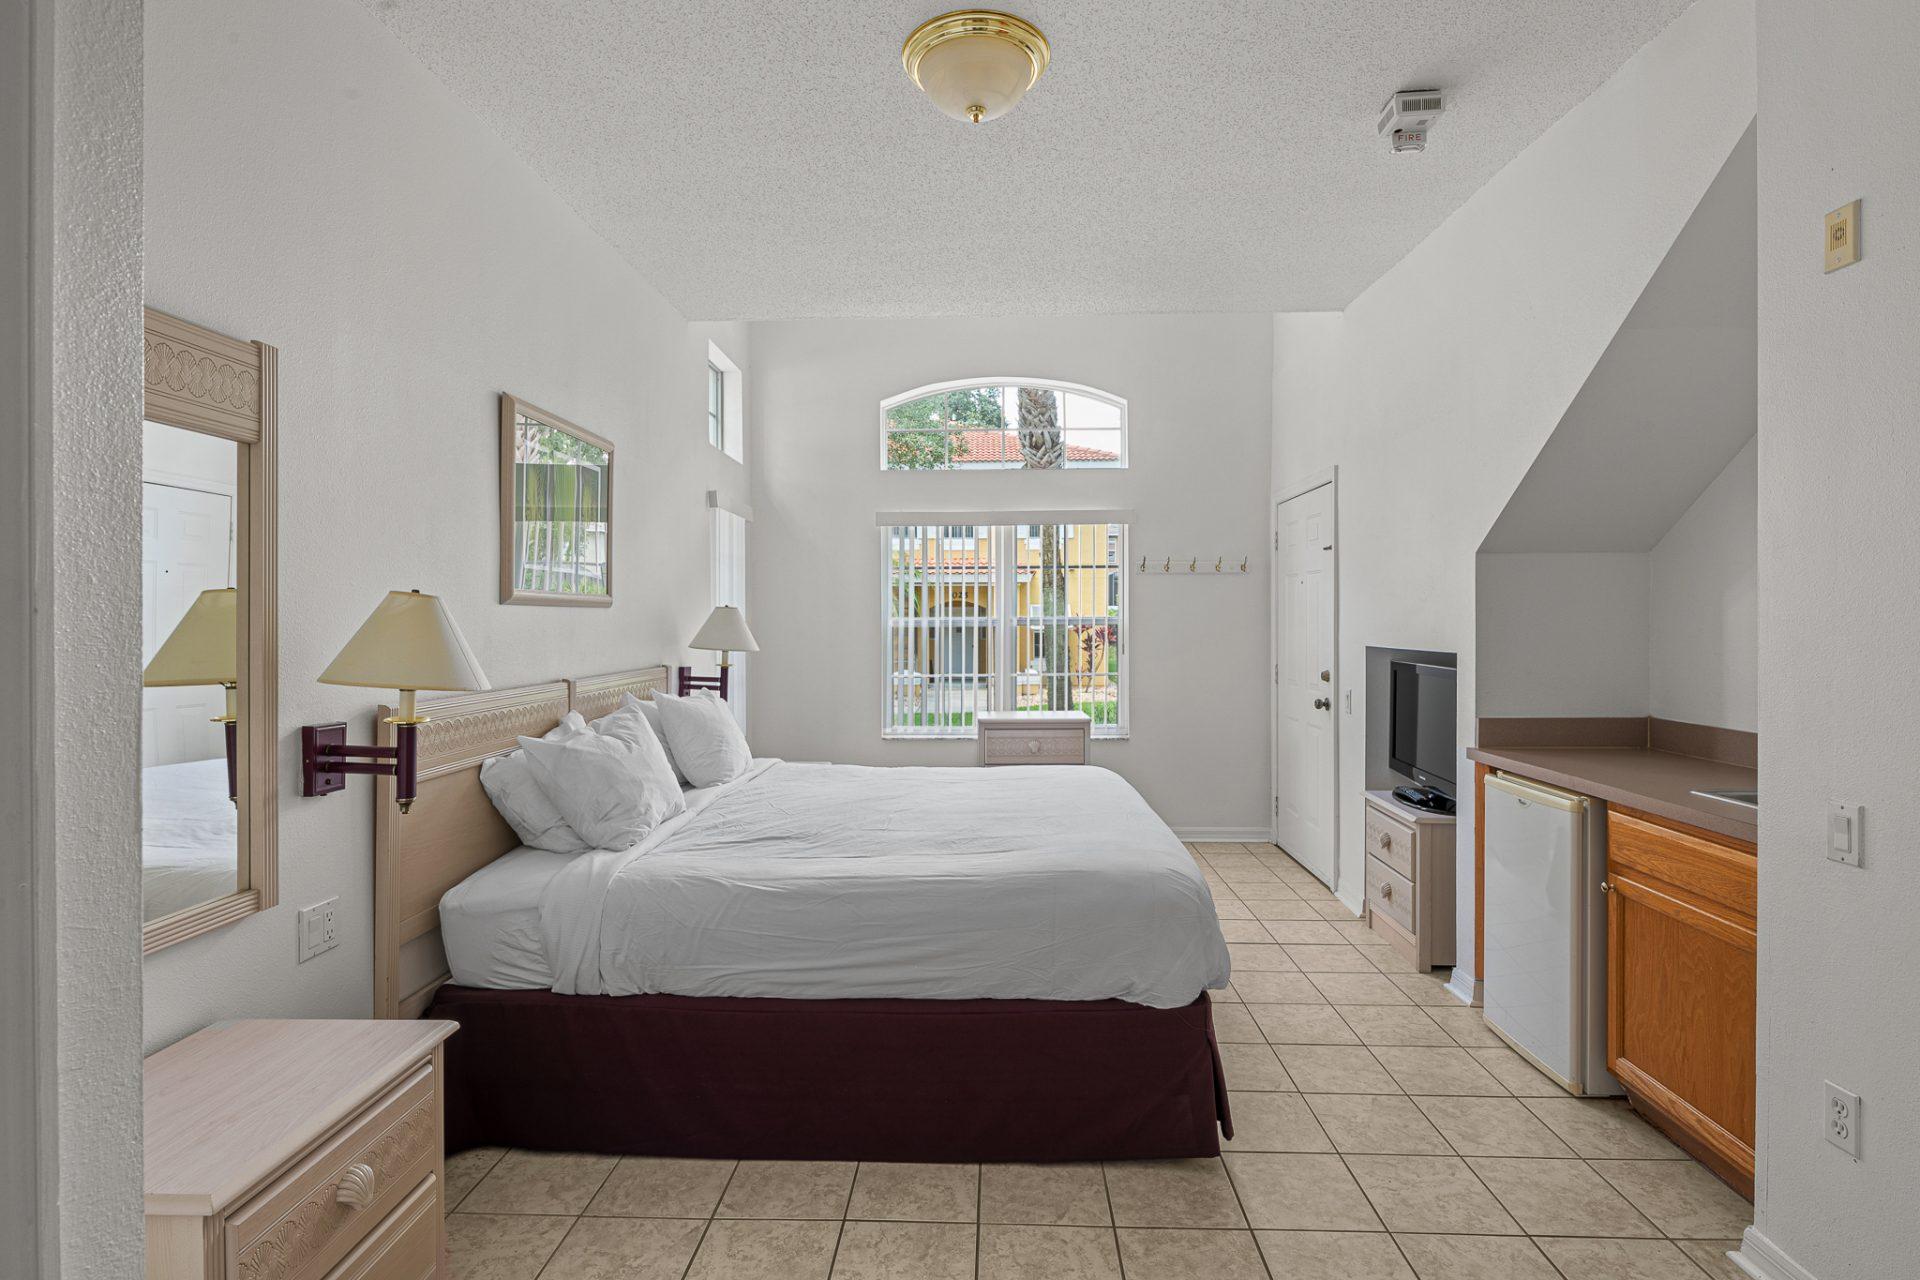 SAR Apartment Capital- Berkely Lake Townhomes (4)